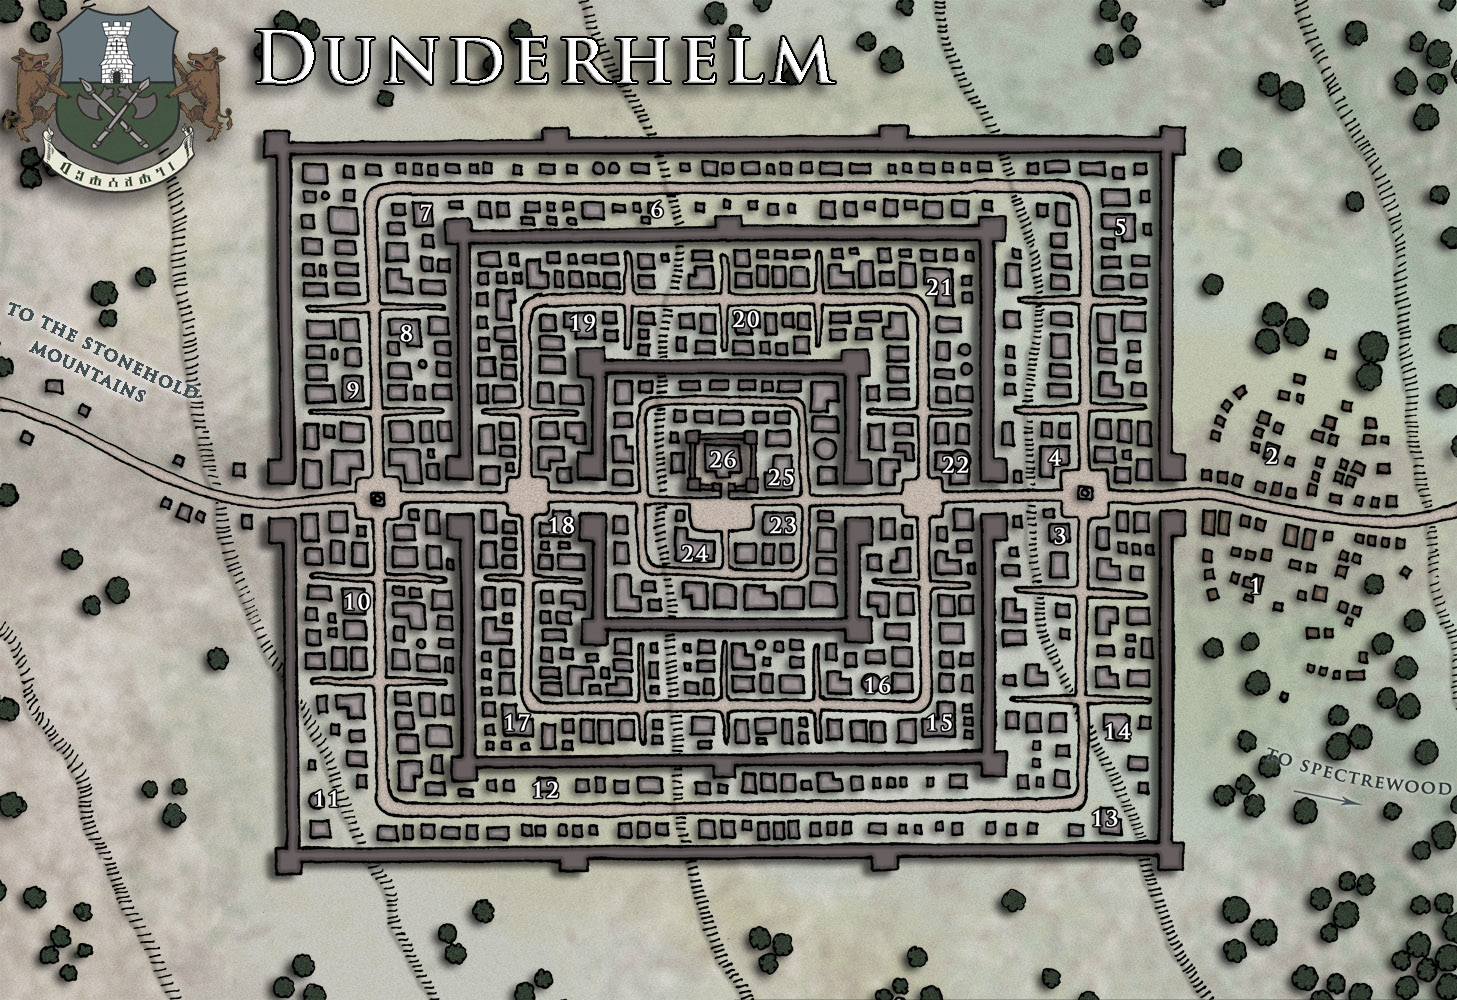 Dunderhelm